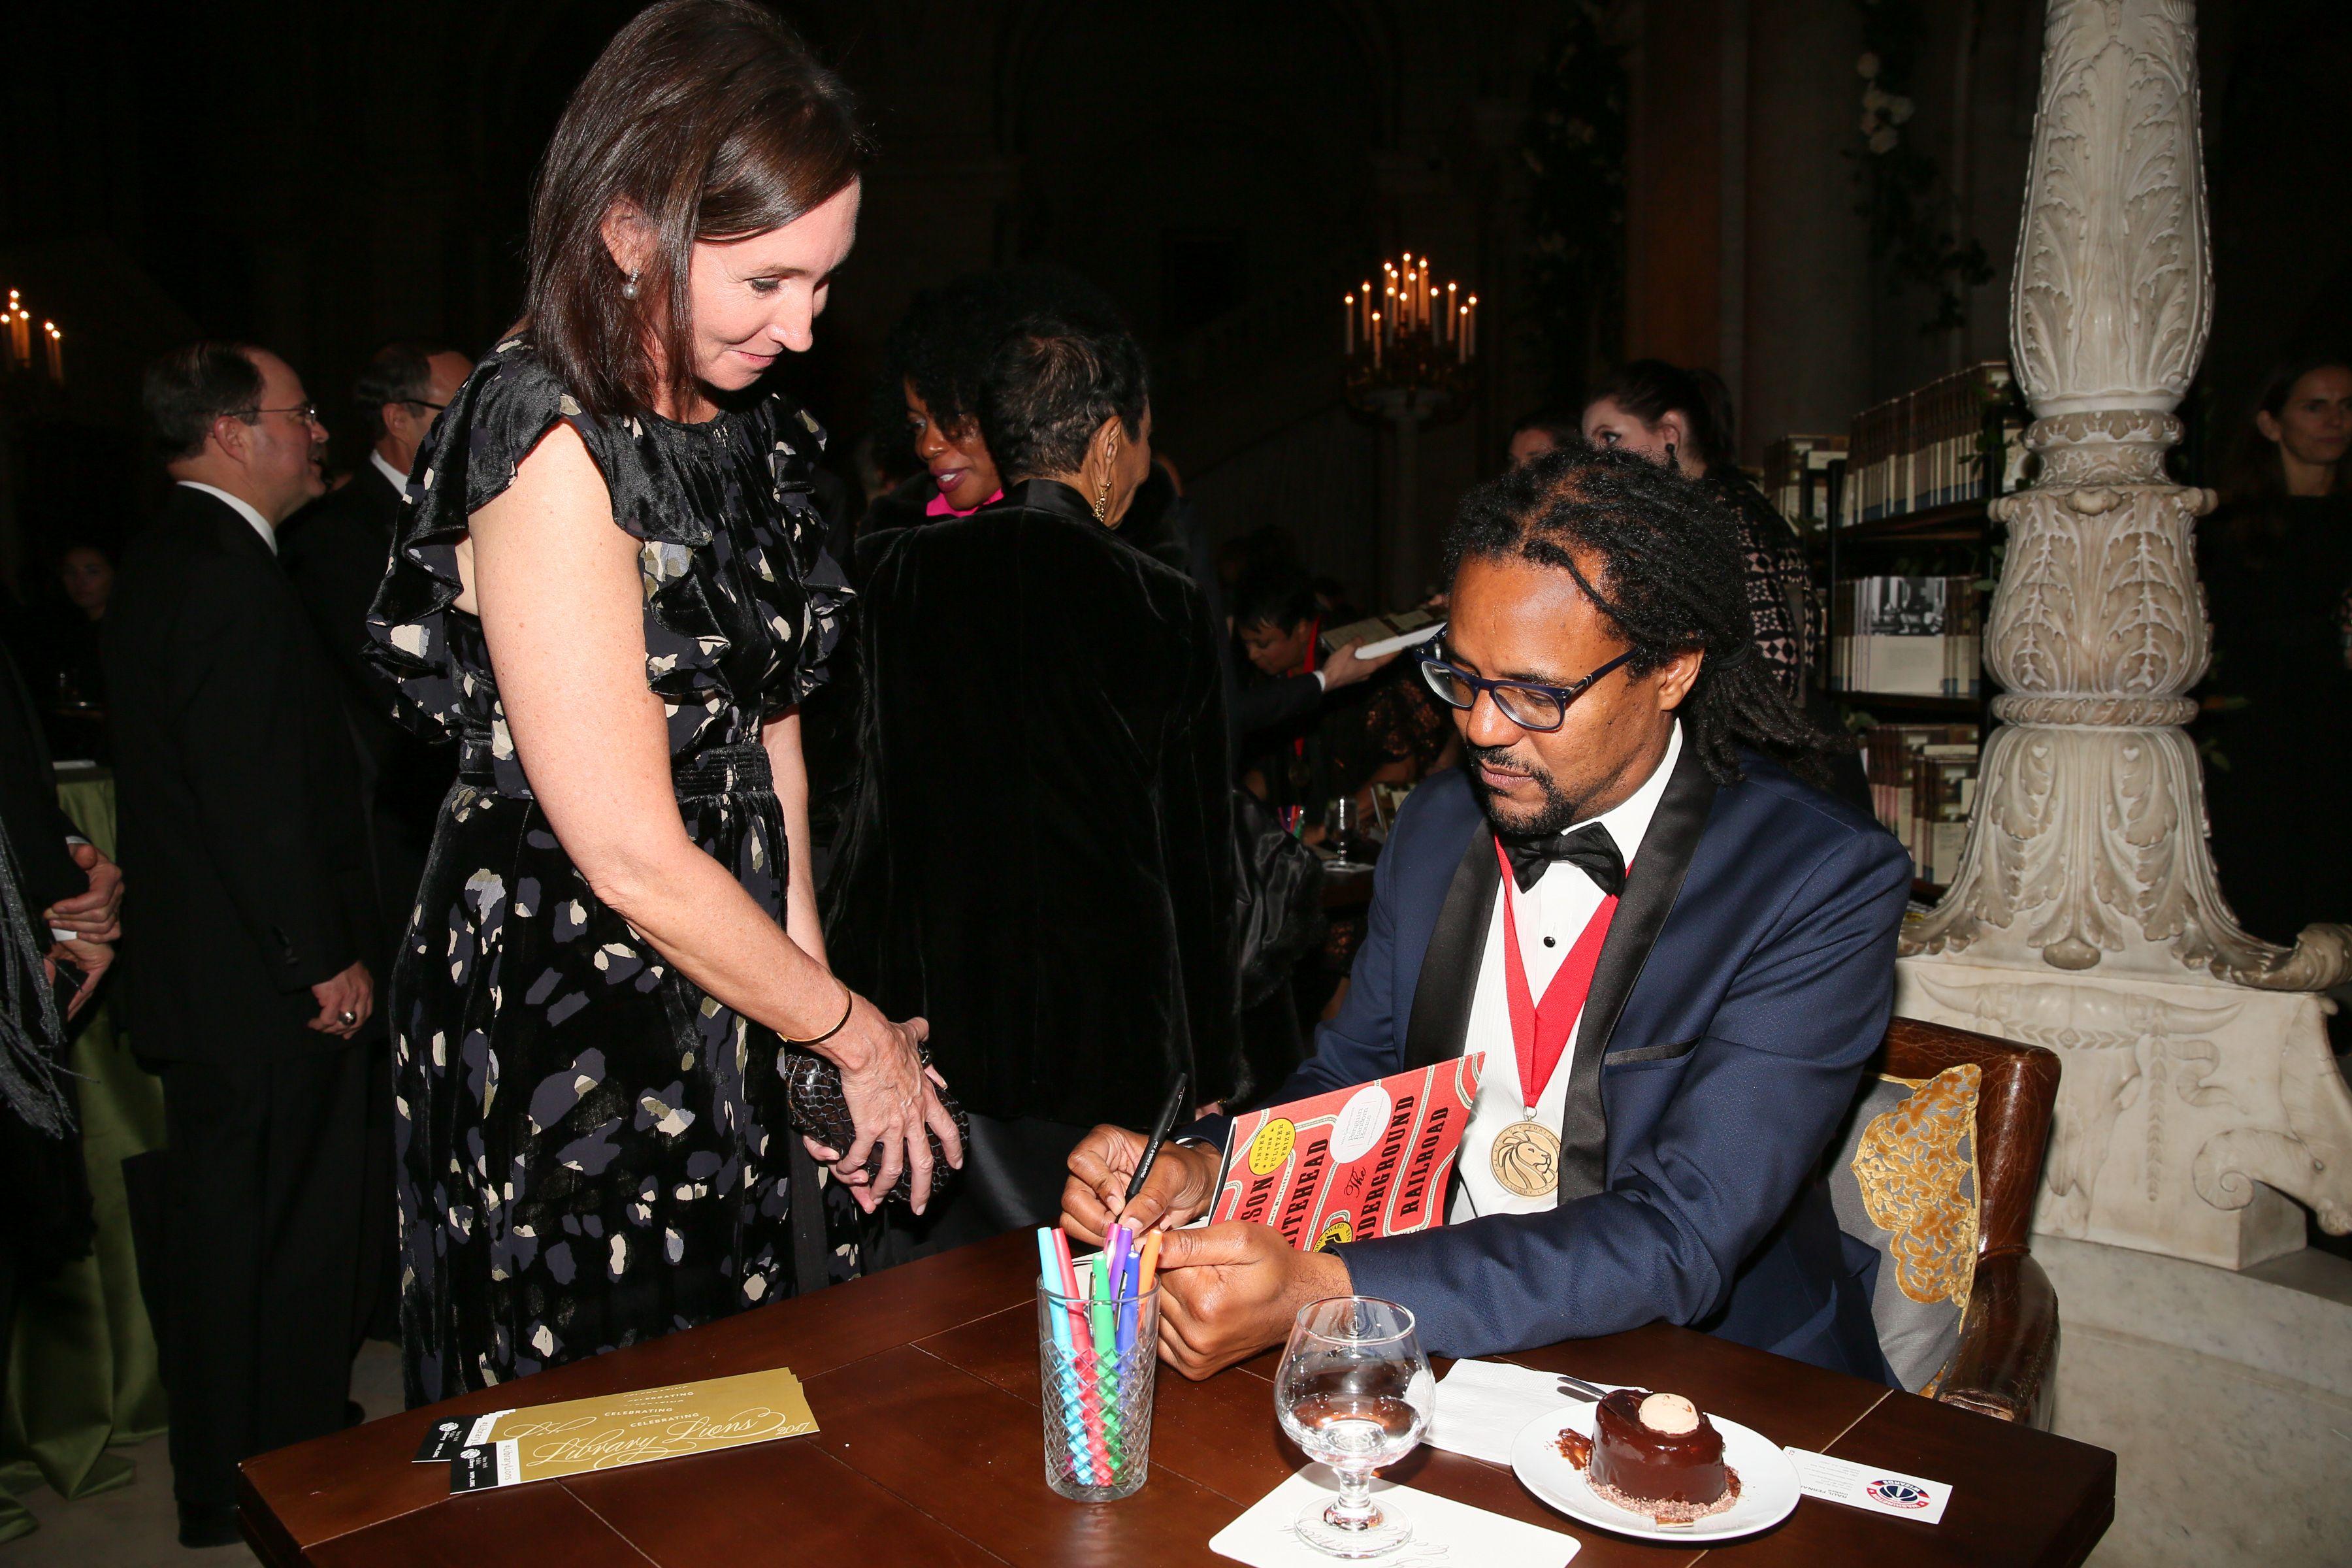 Colson WhiteheadNew York Public Library Lions Gala, Inside, New York, USA - 06 Nov 2017